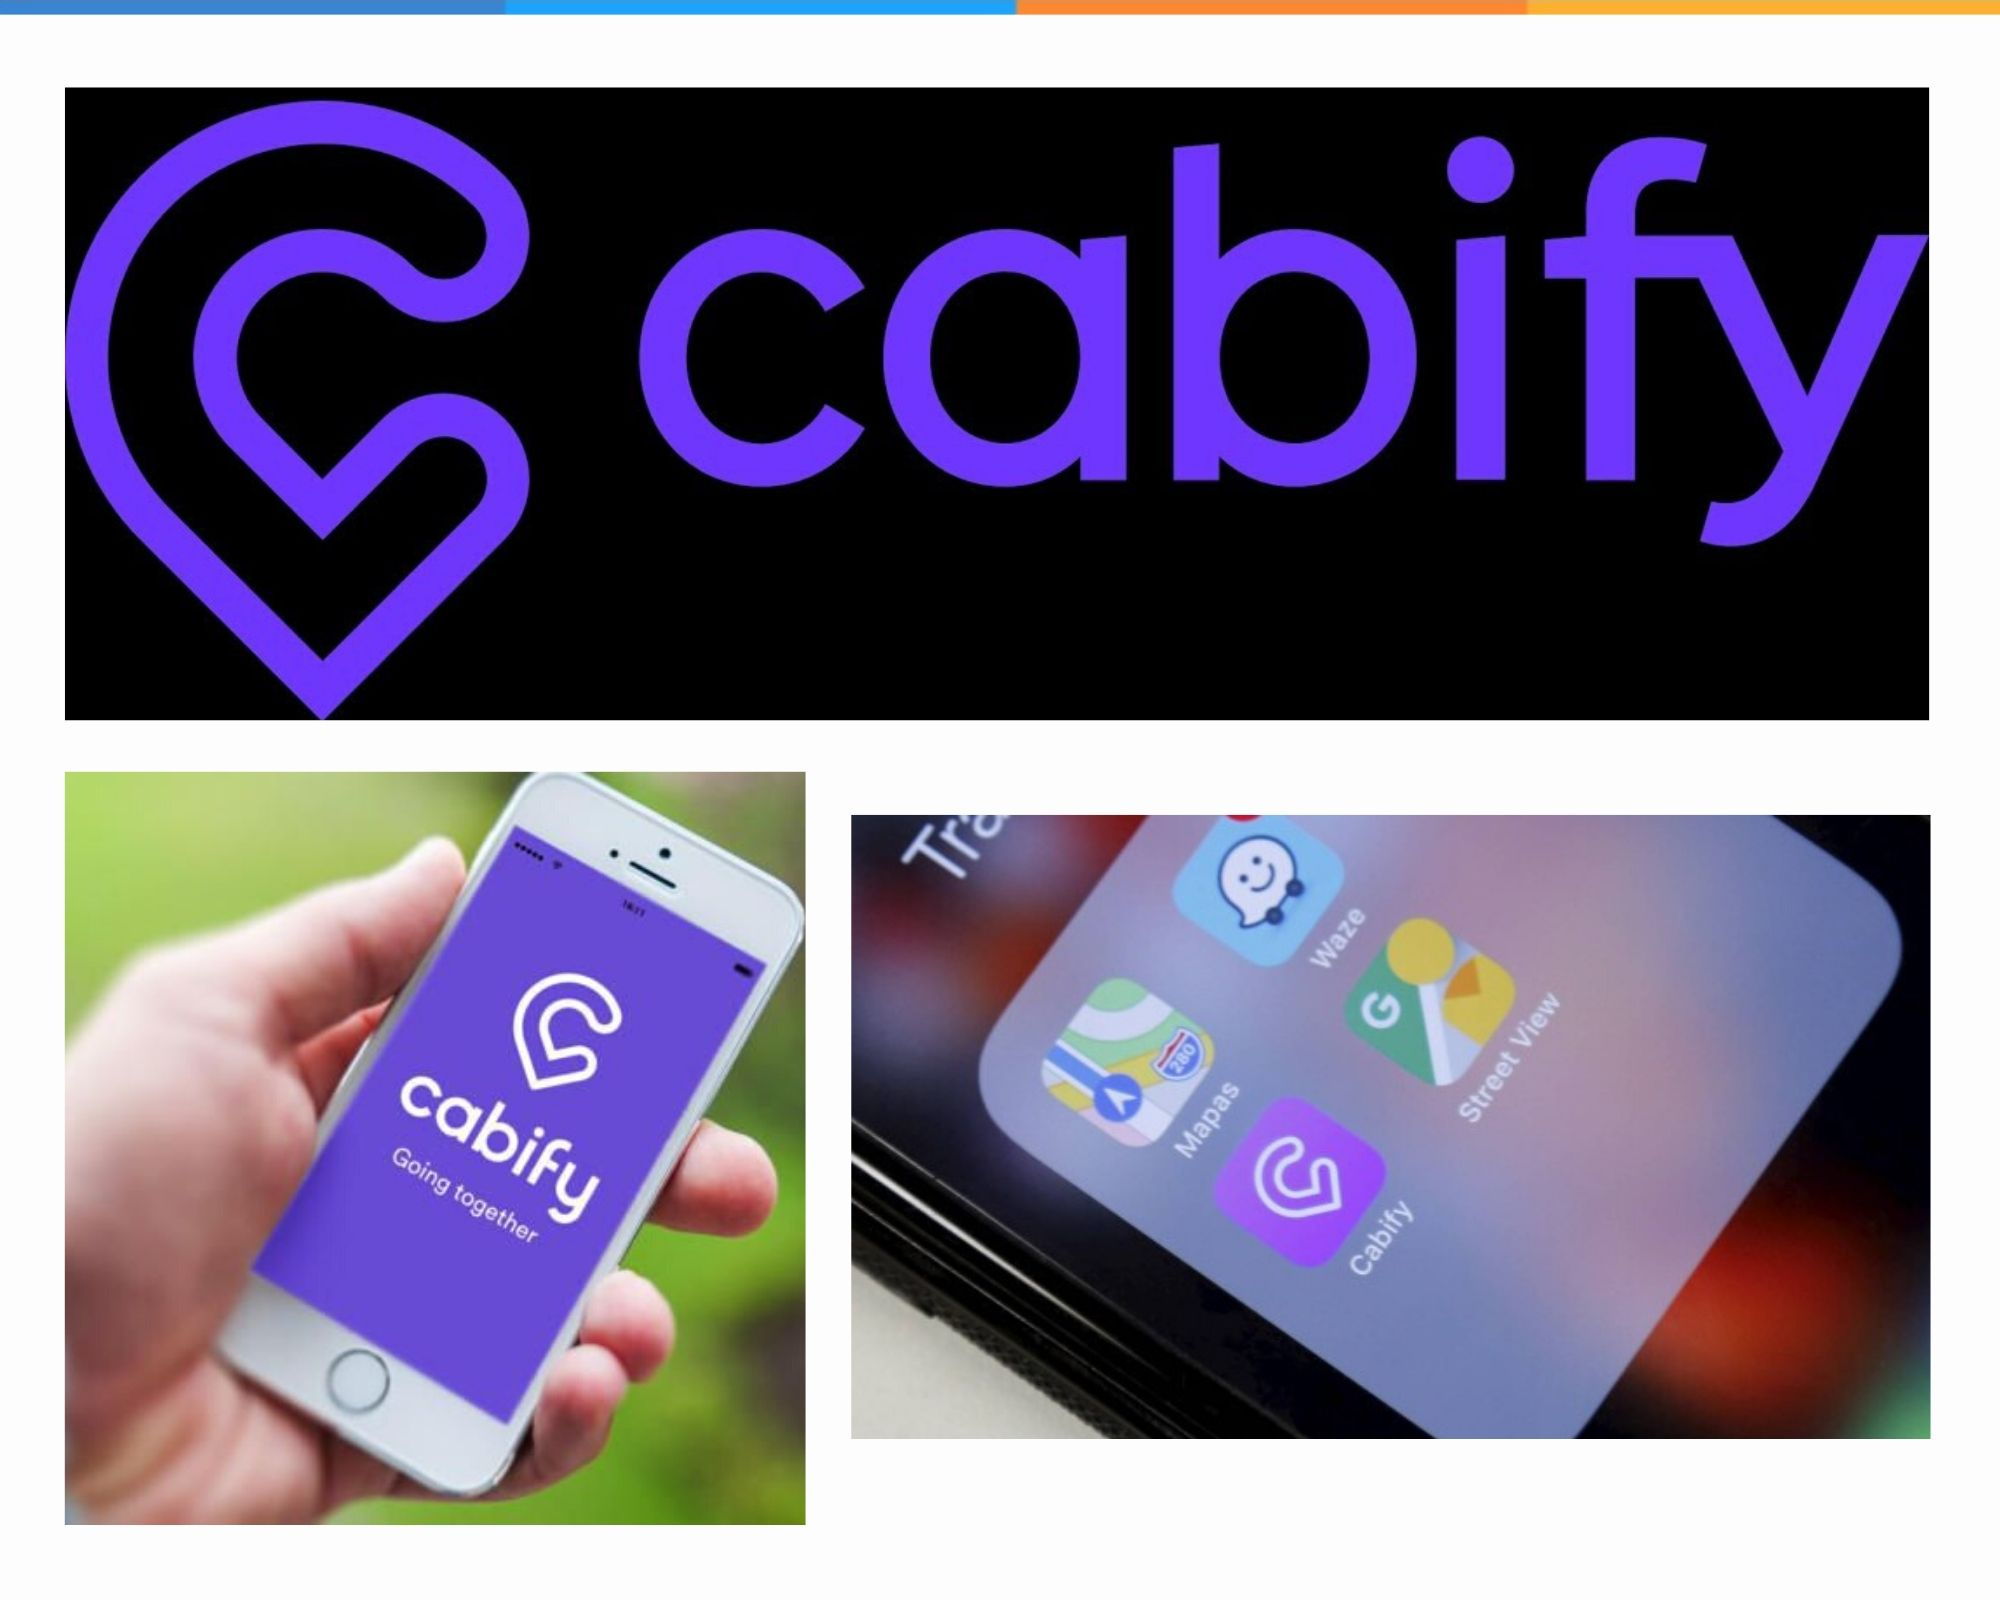 Cabify!